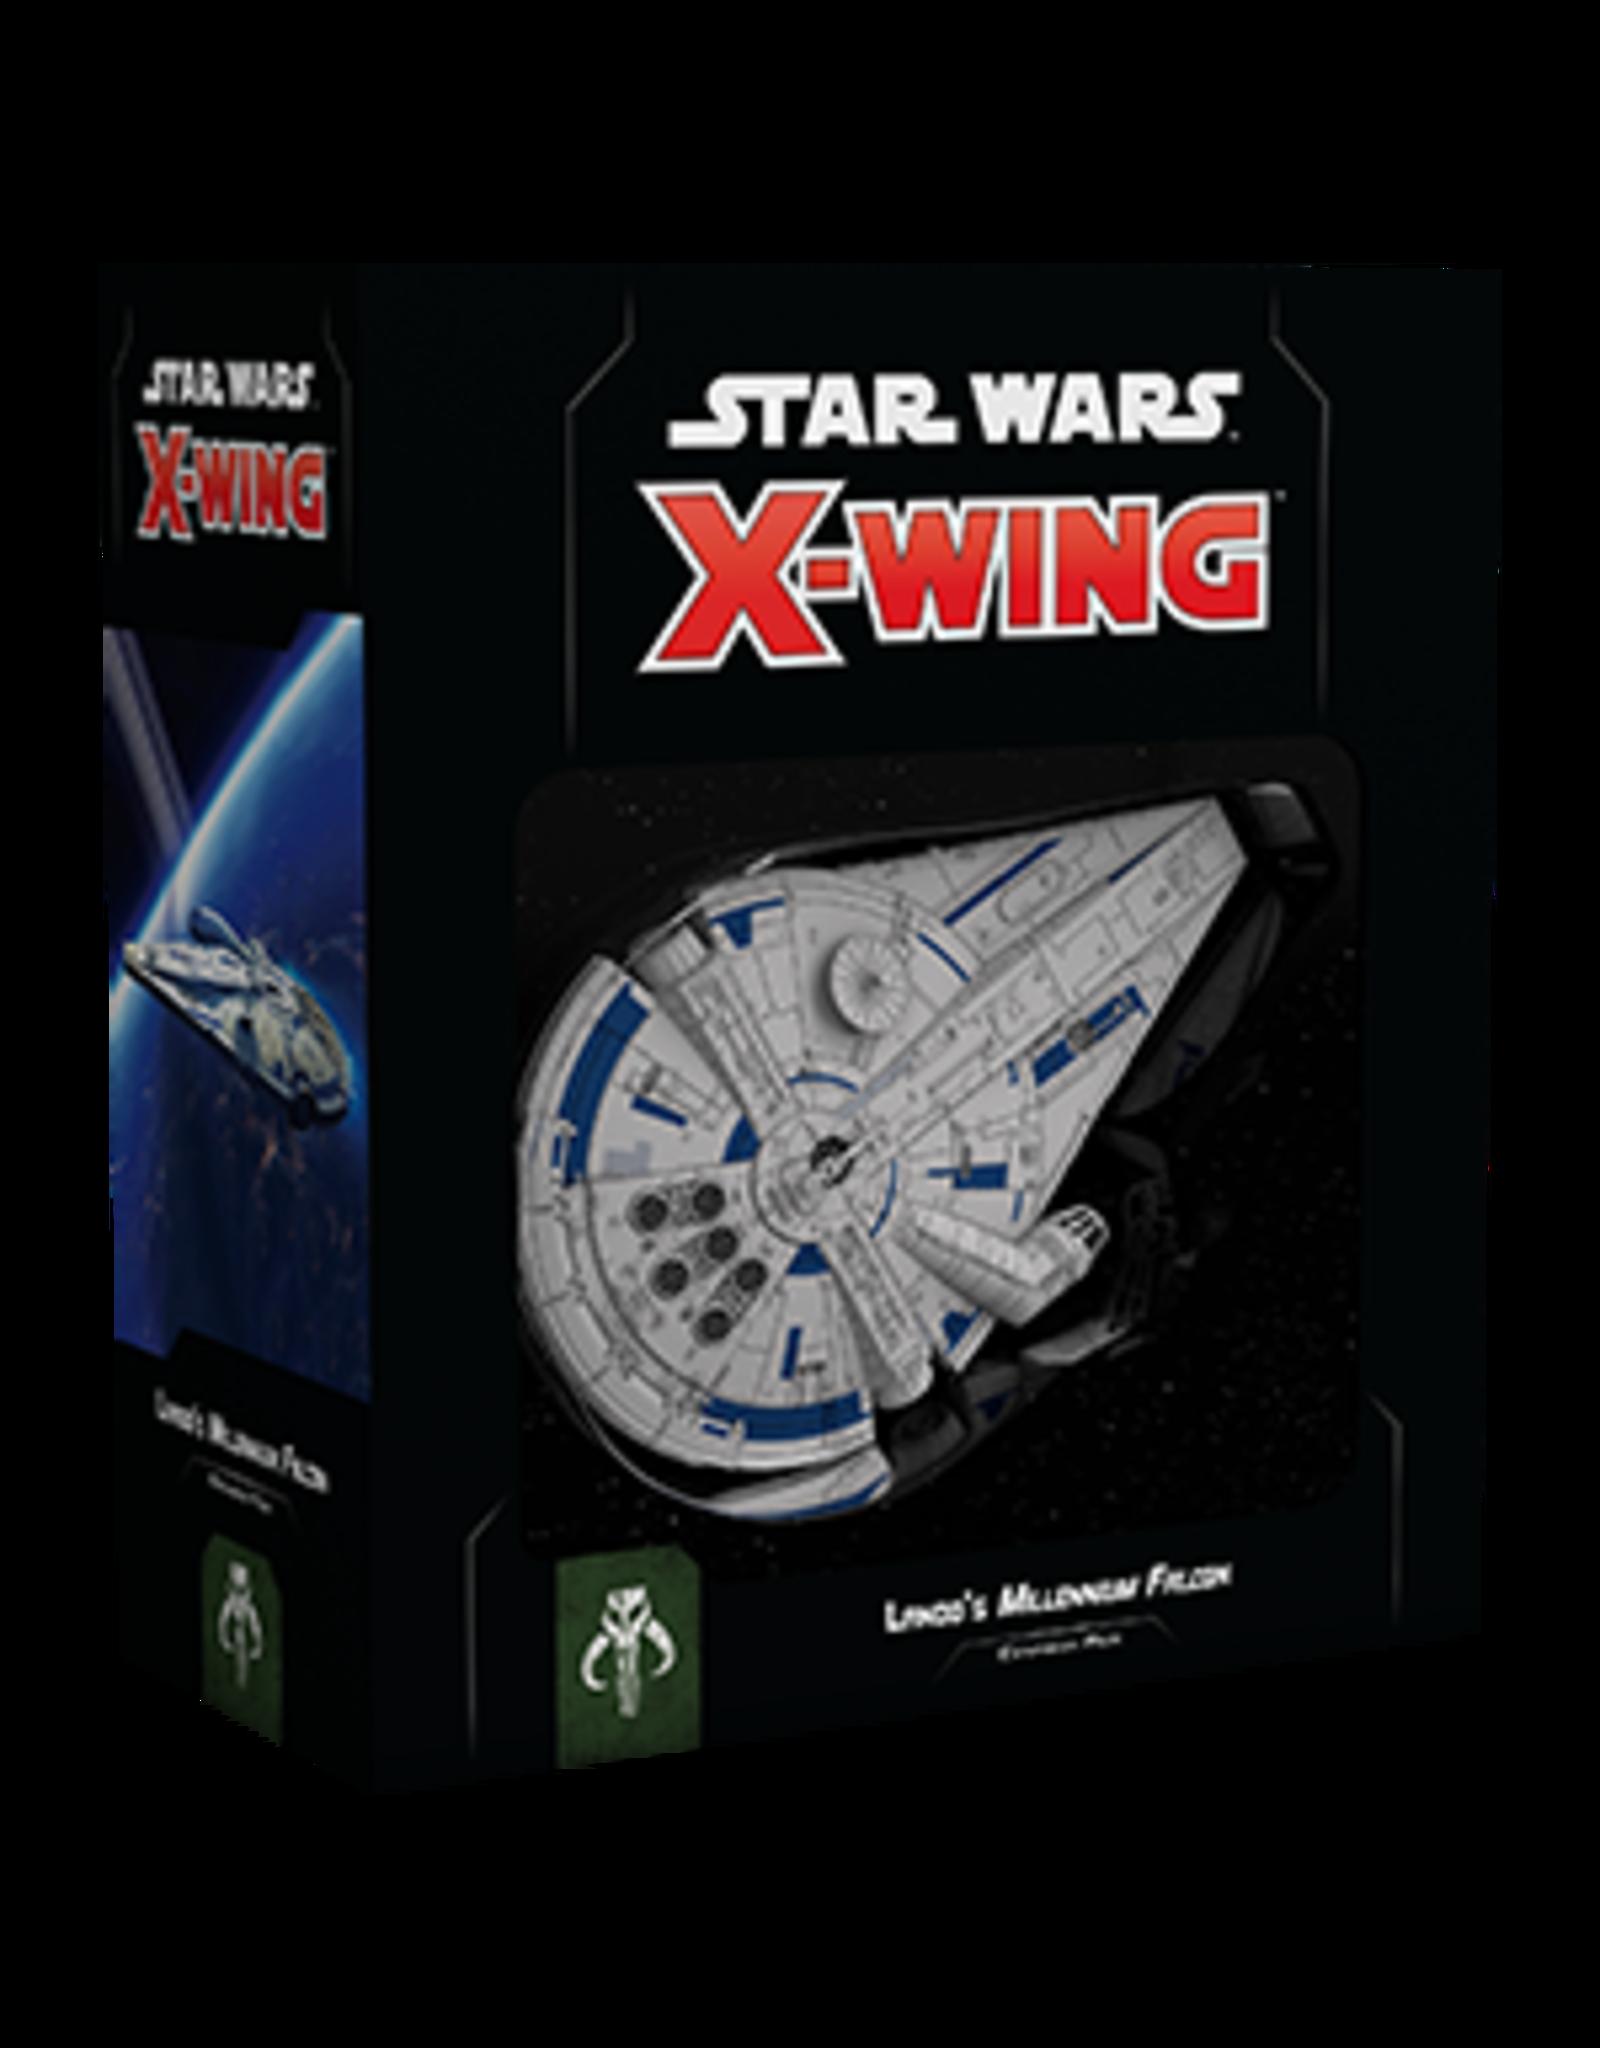 Fantasy Flight Games Star Wars X-wing 2E: Lando's Millennium Falcon